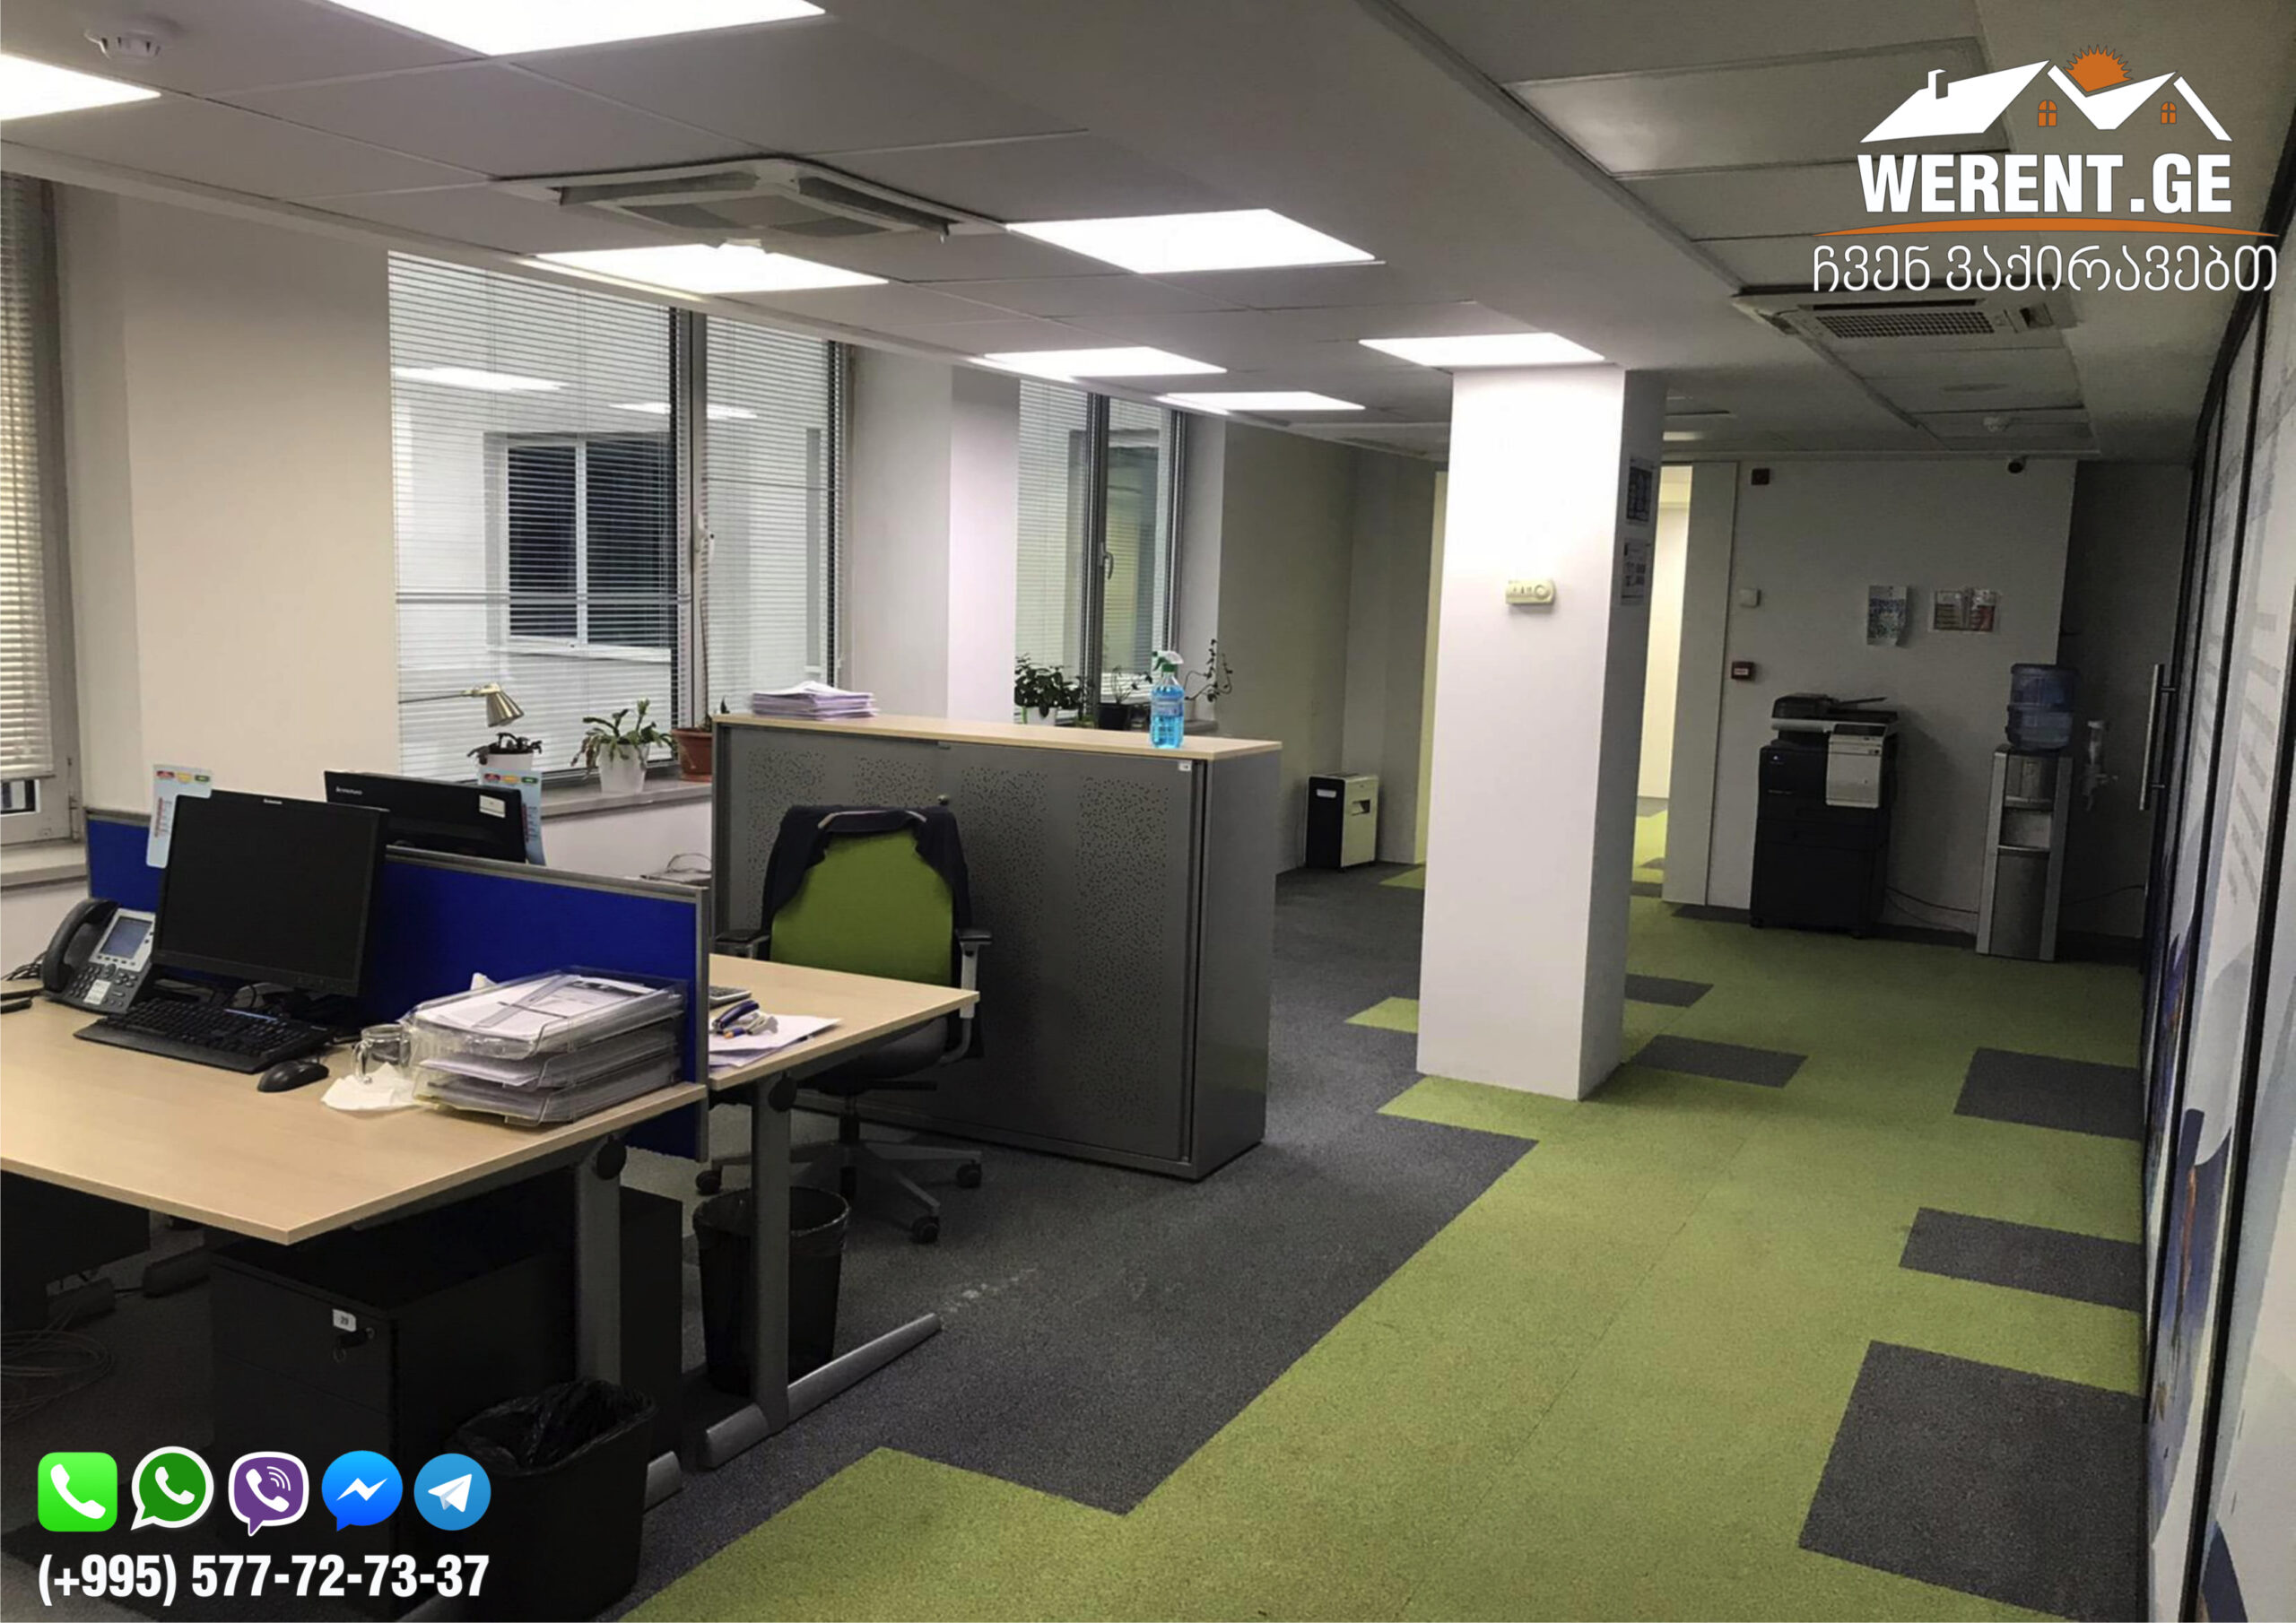 BCV presentation office space 689 sq m-10_wm